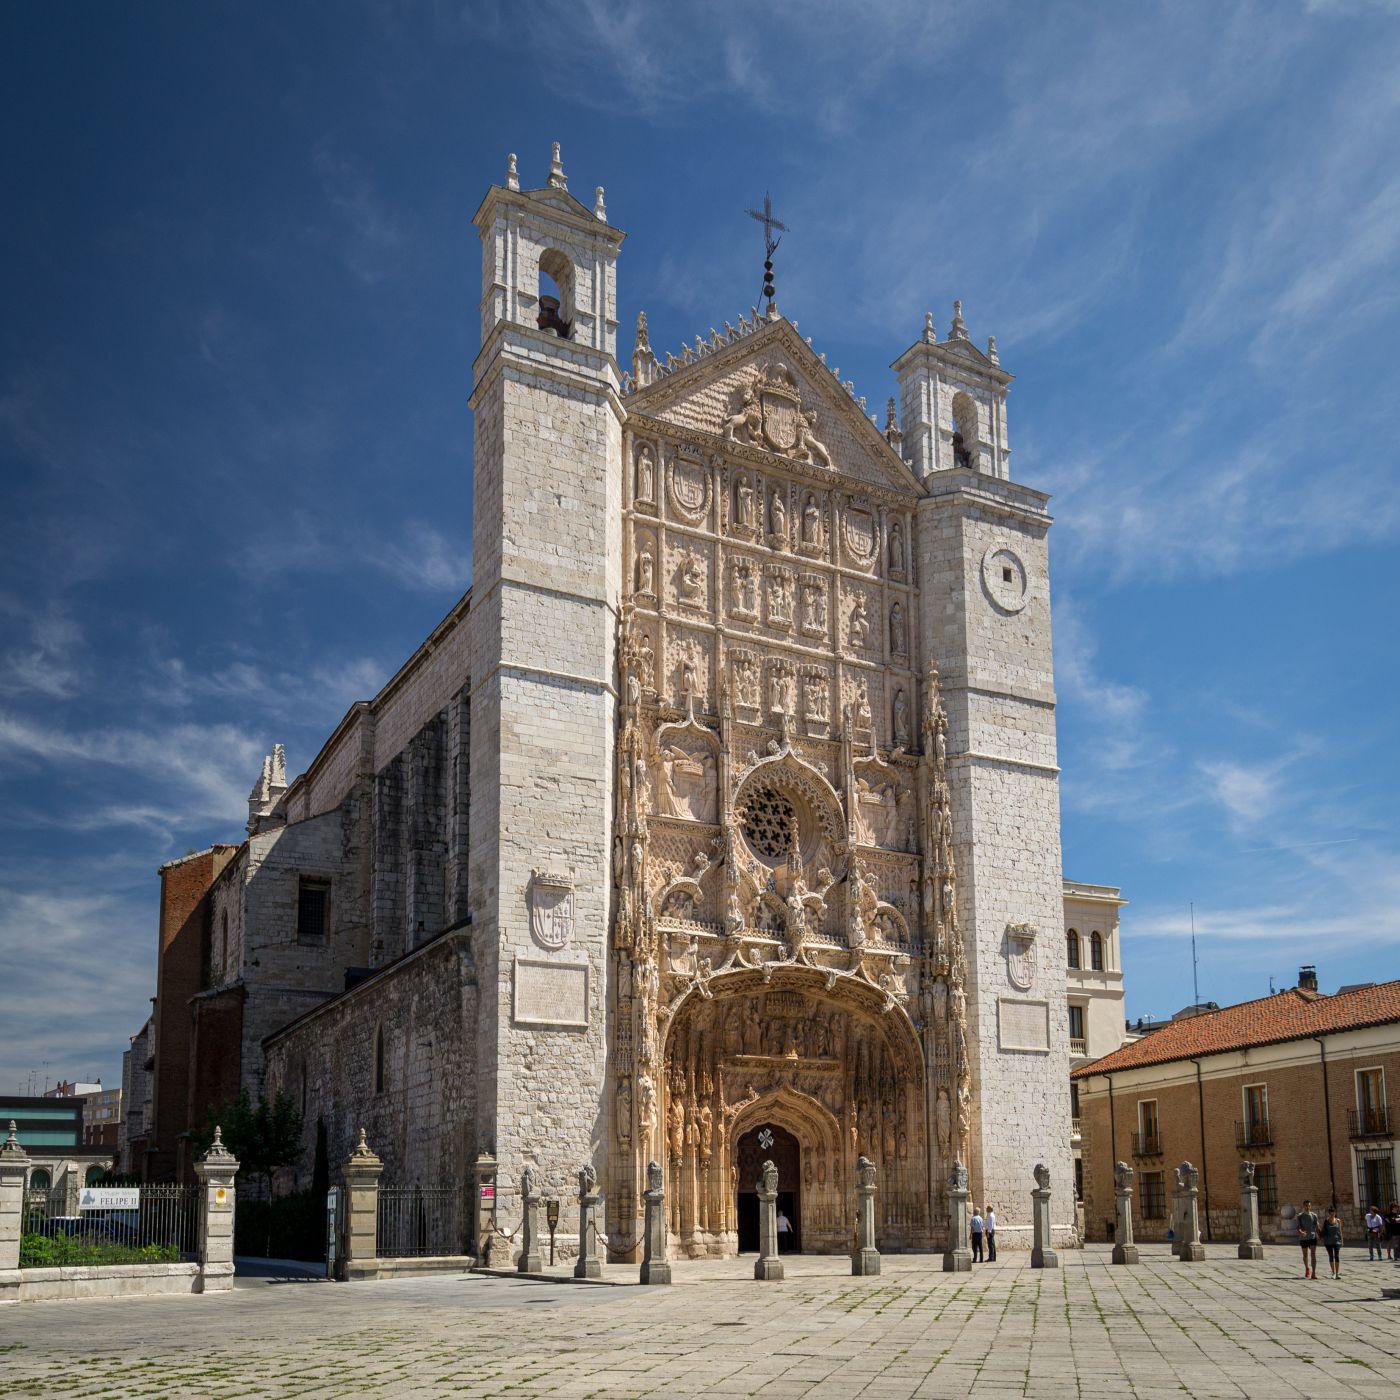 Iglesia de San Pablo de Valladolid, Spain